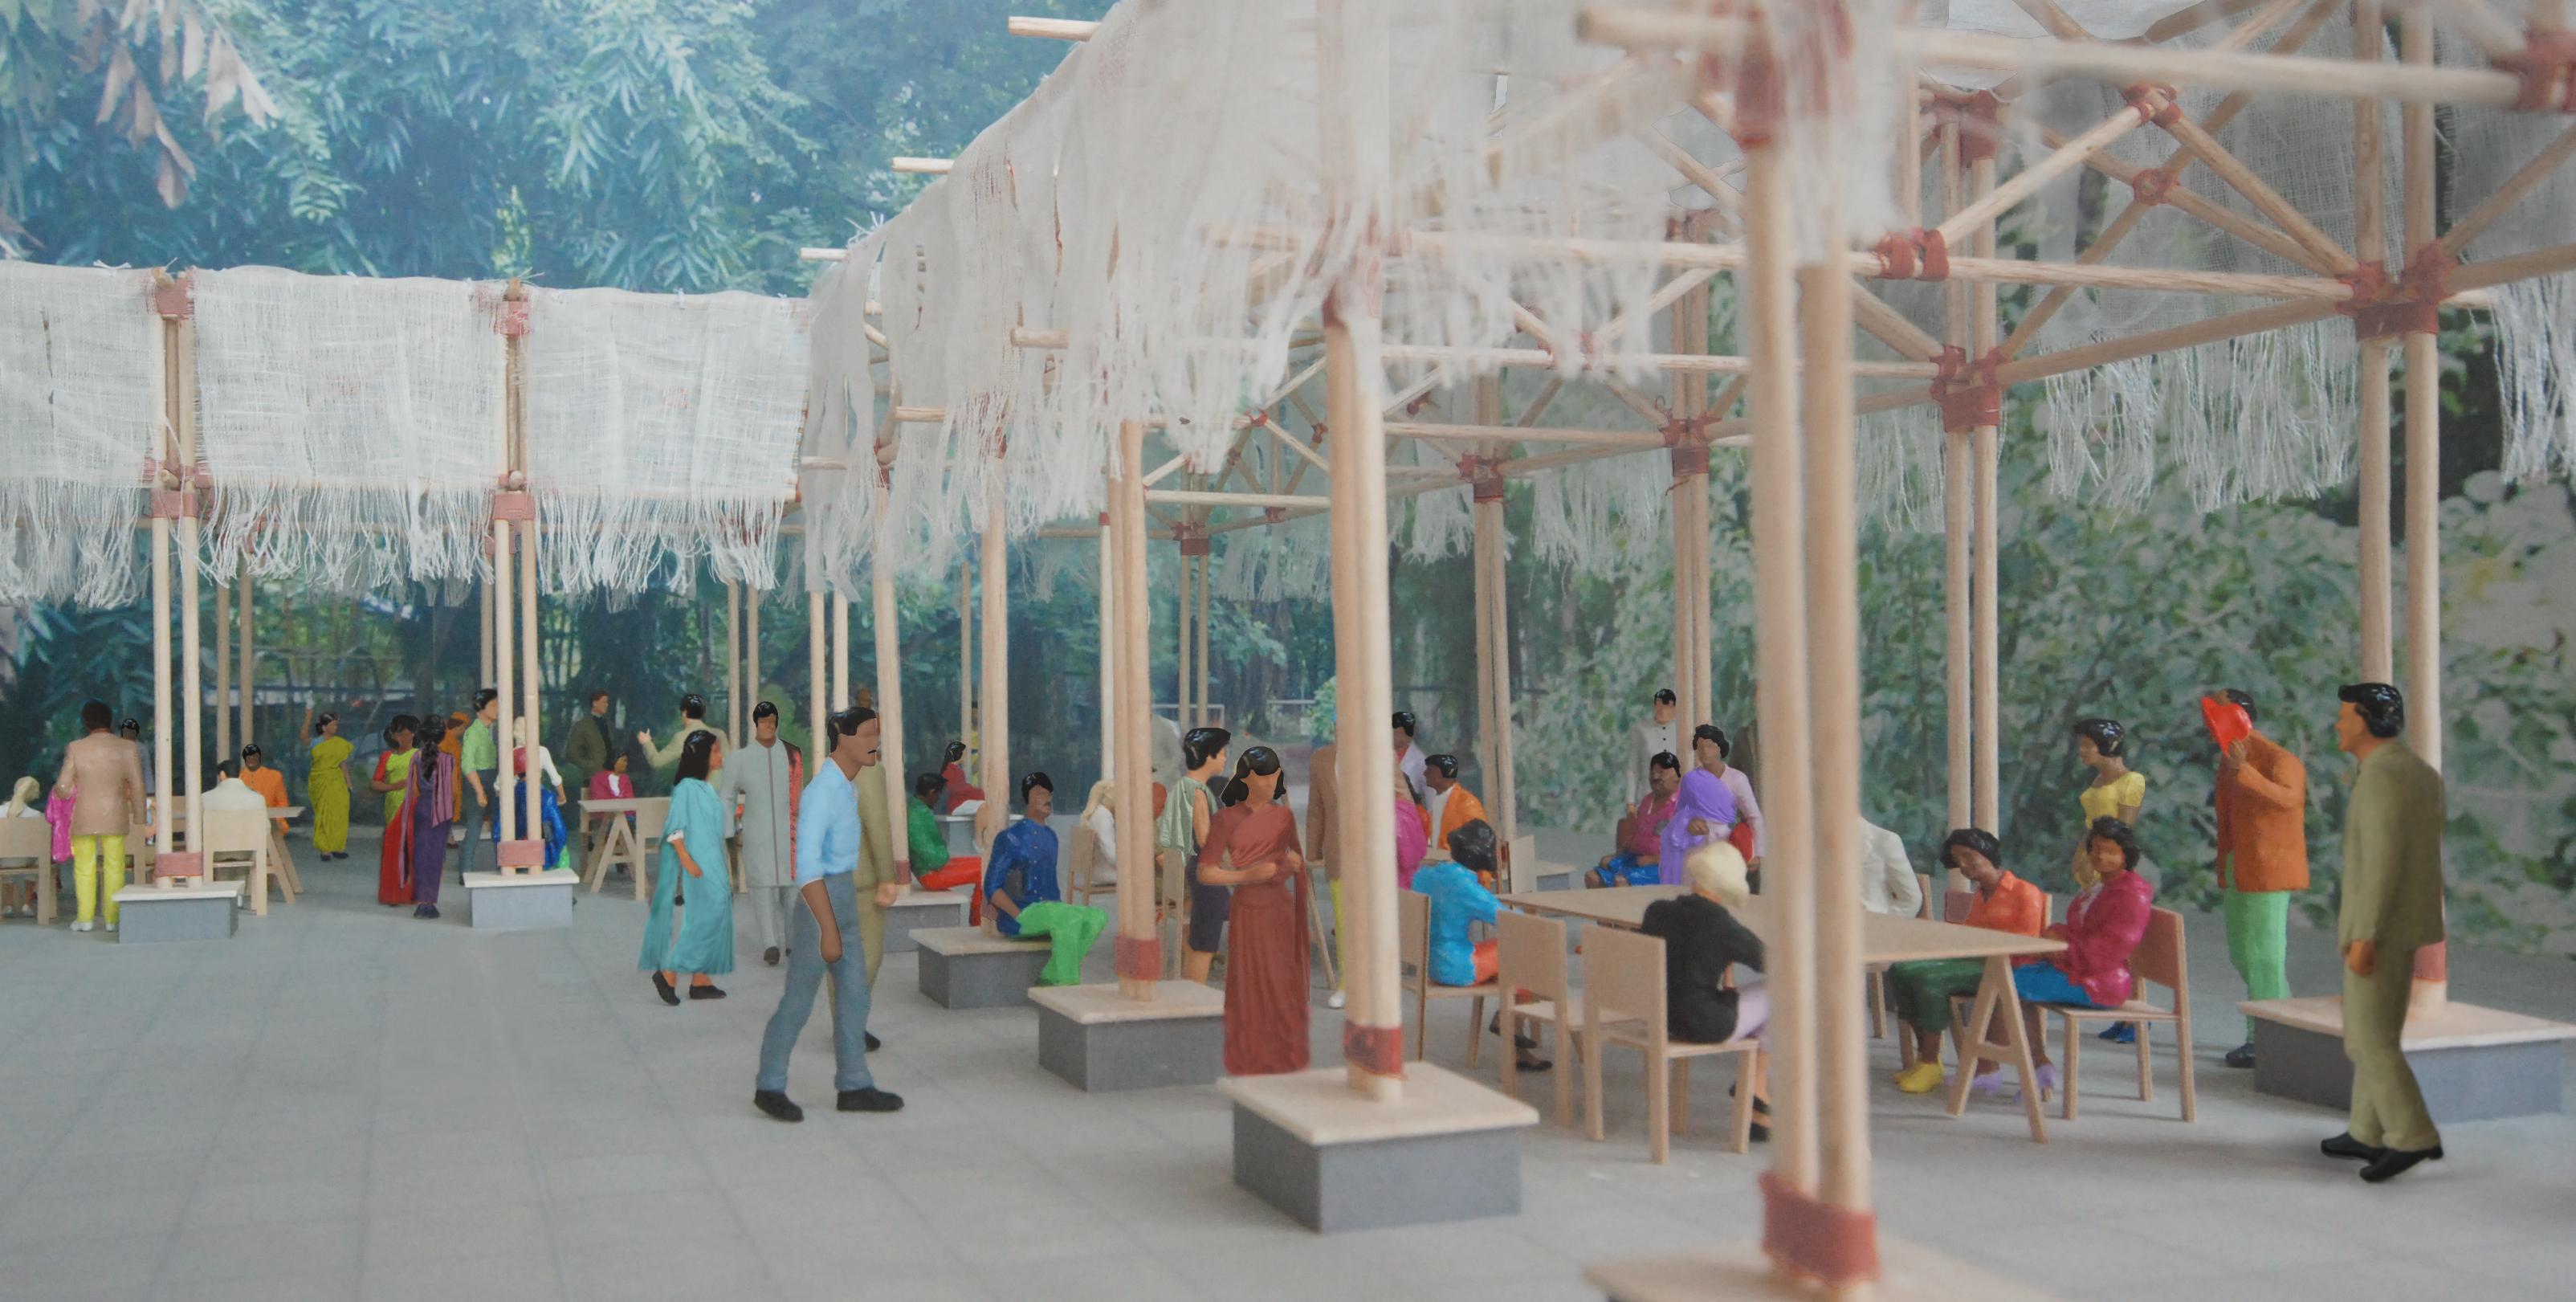 bmw guggenheim lab, achitecture, mumbai, urban design, urban life